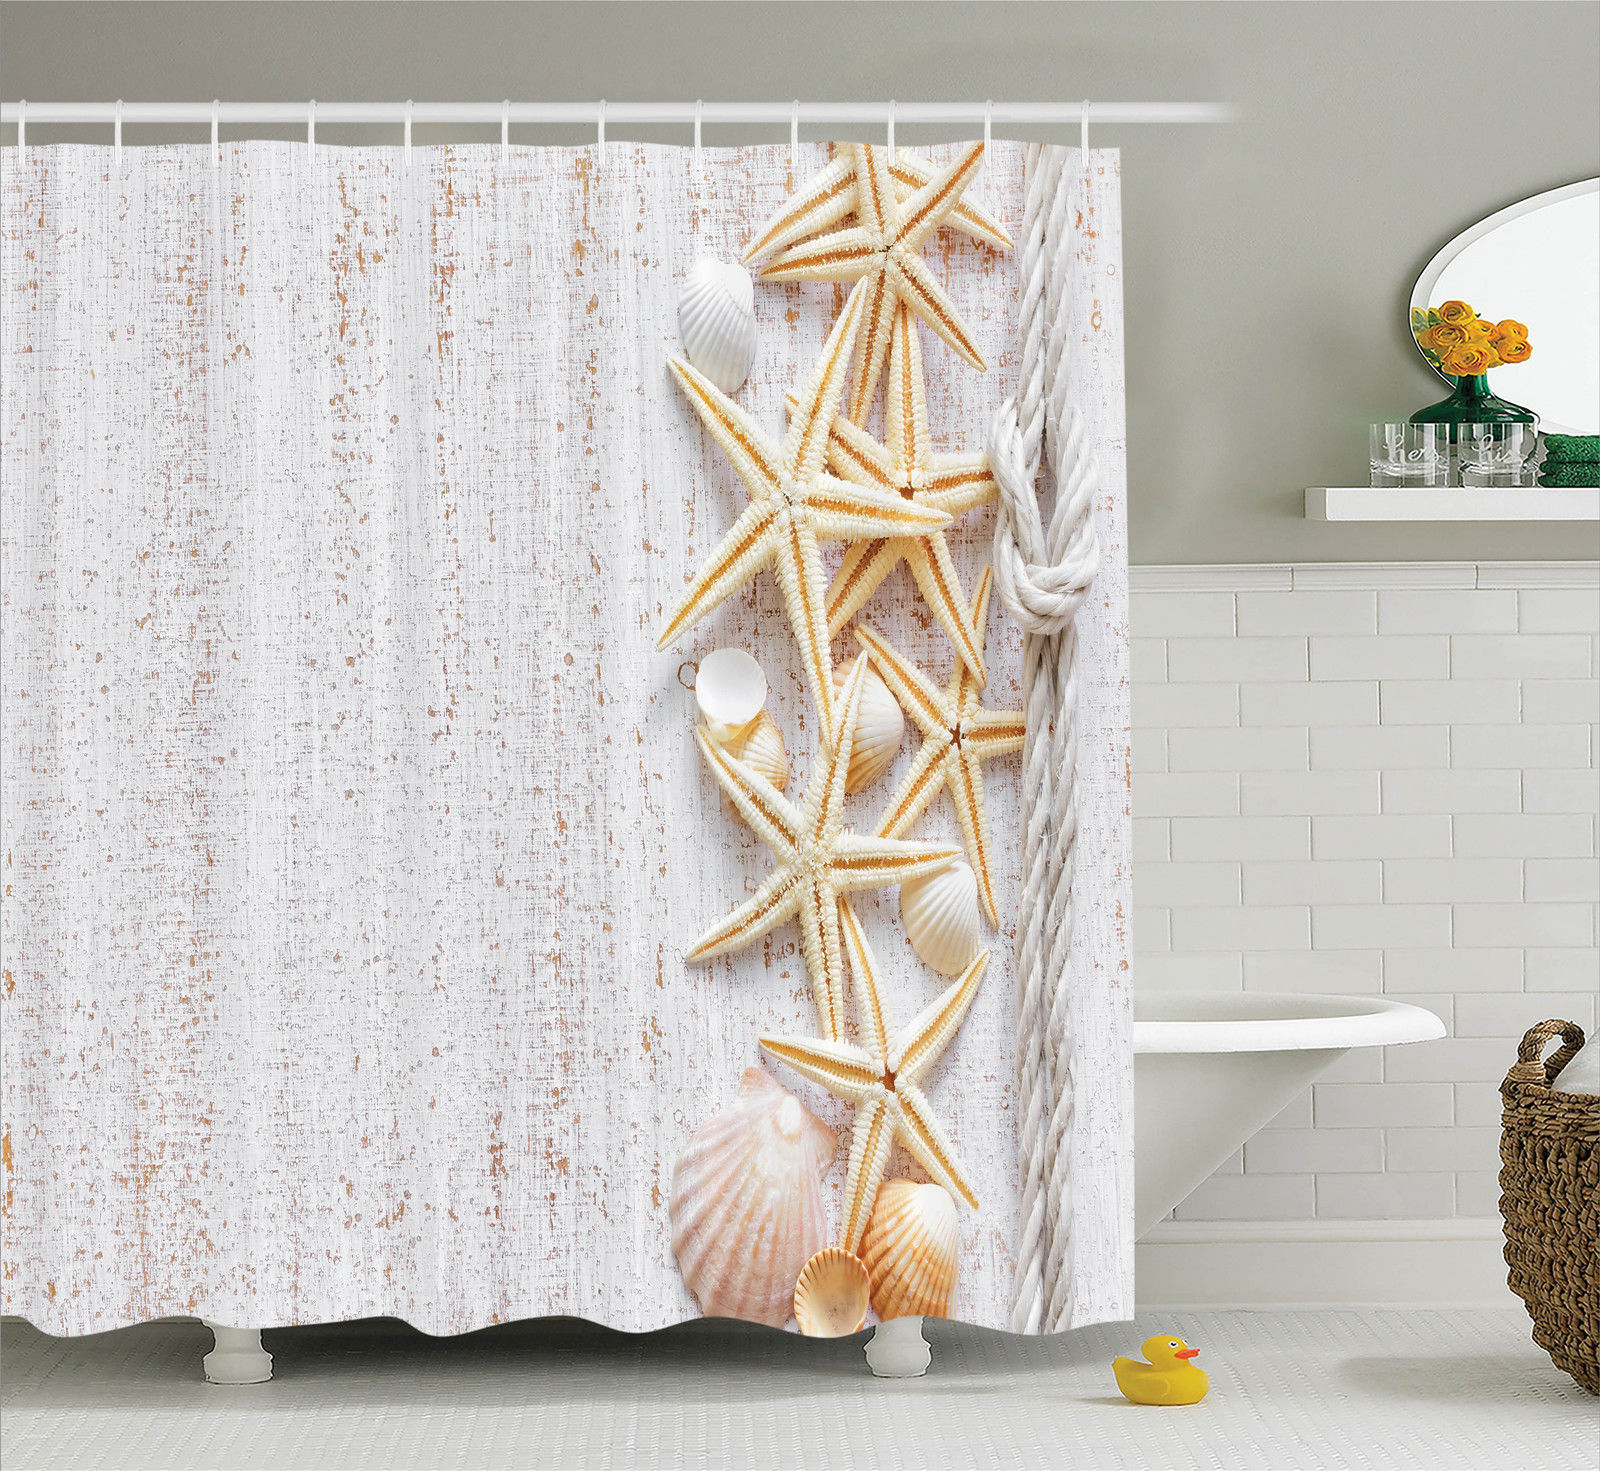 Seashell shower curtain bathroom set